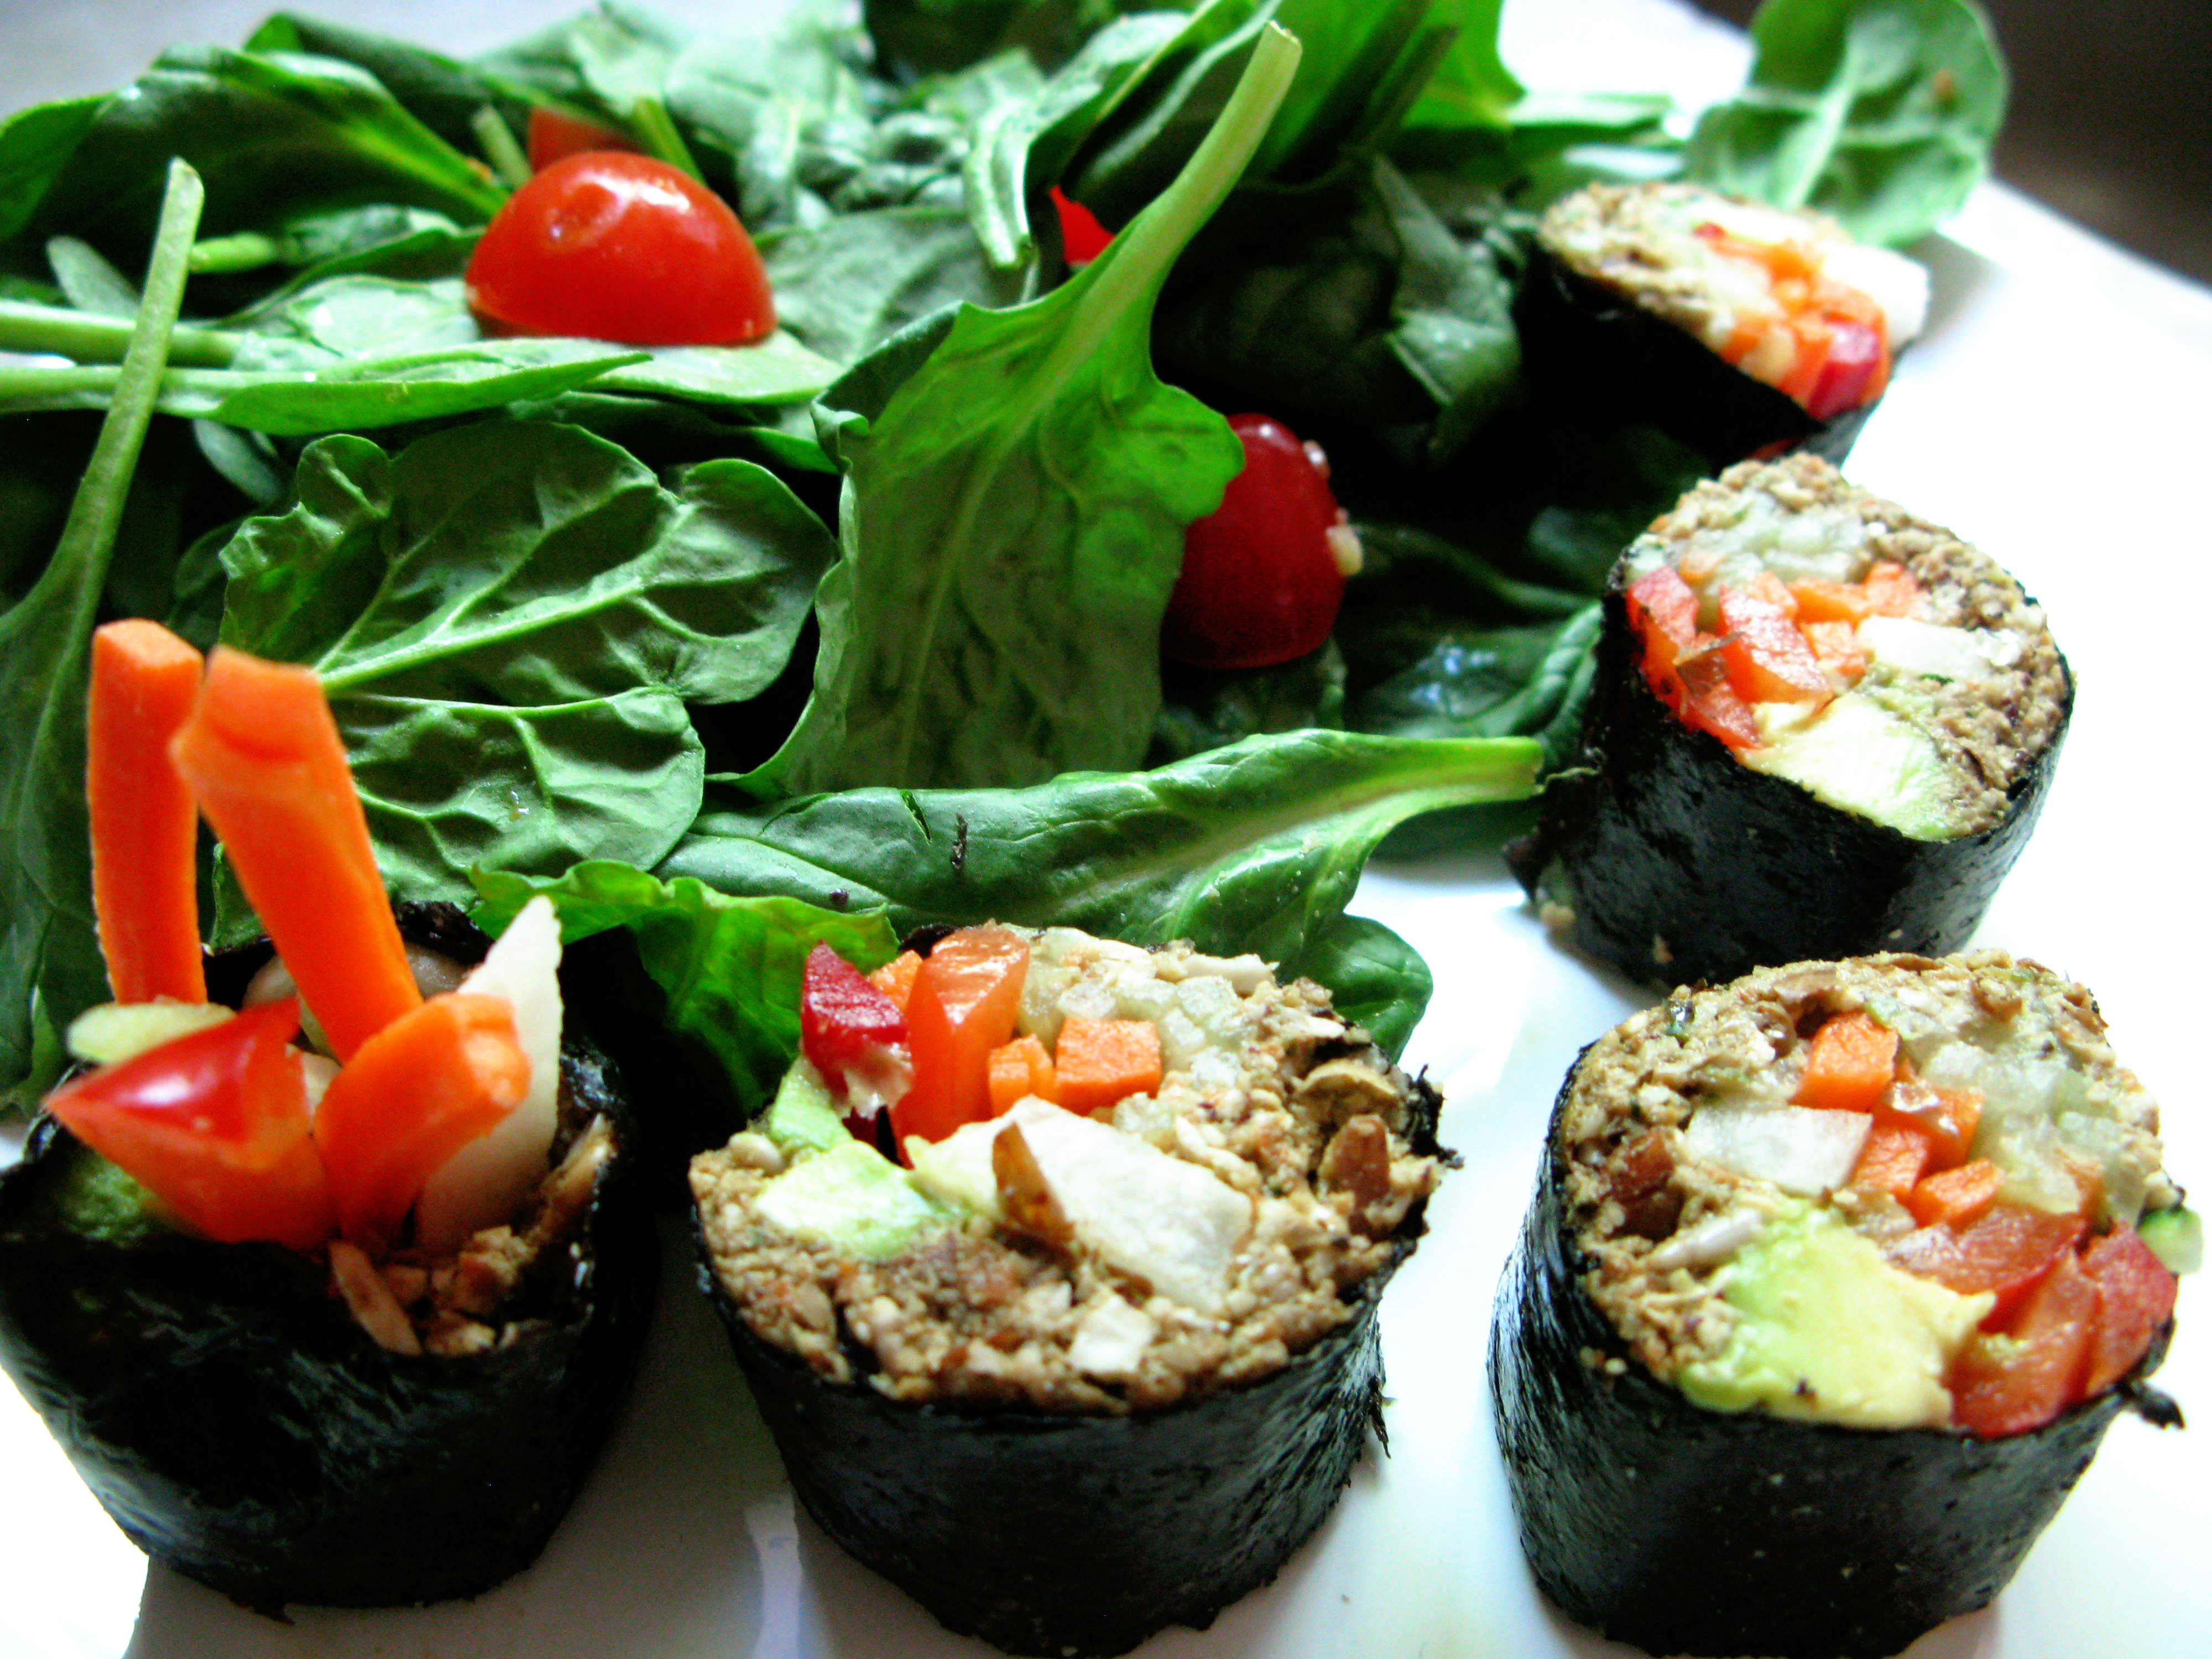 Raw food recipes with pictures 10 Best Raw Vegan Recipes-Raw Vegan m